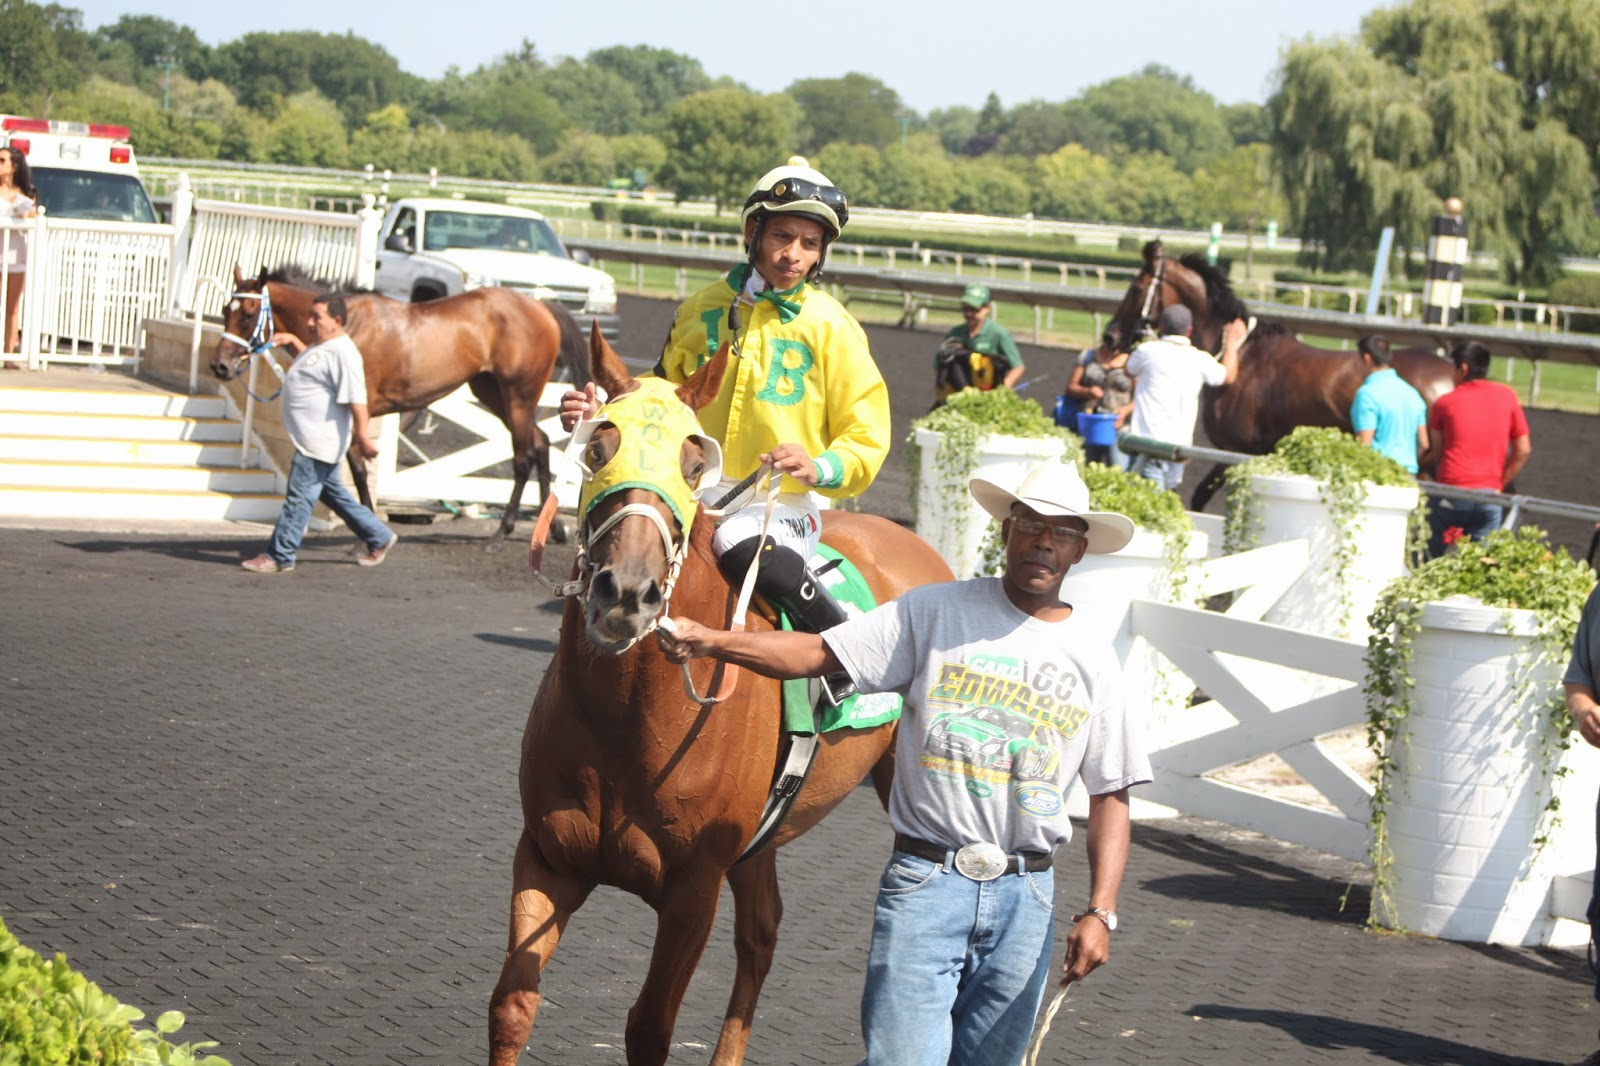 Horse at Arlington Park